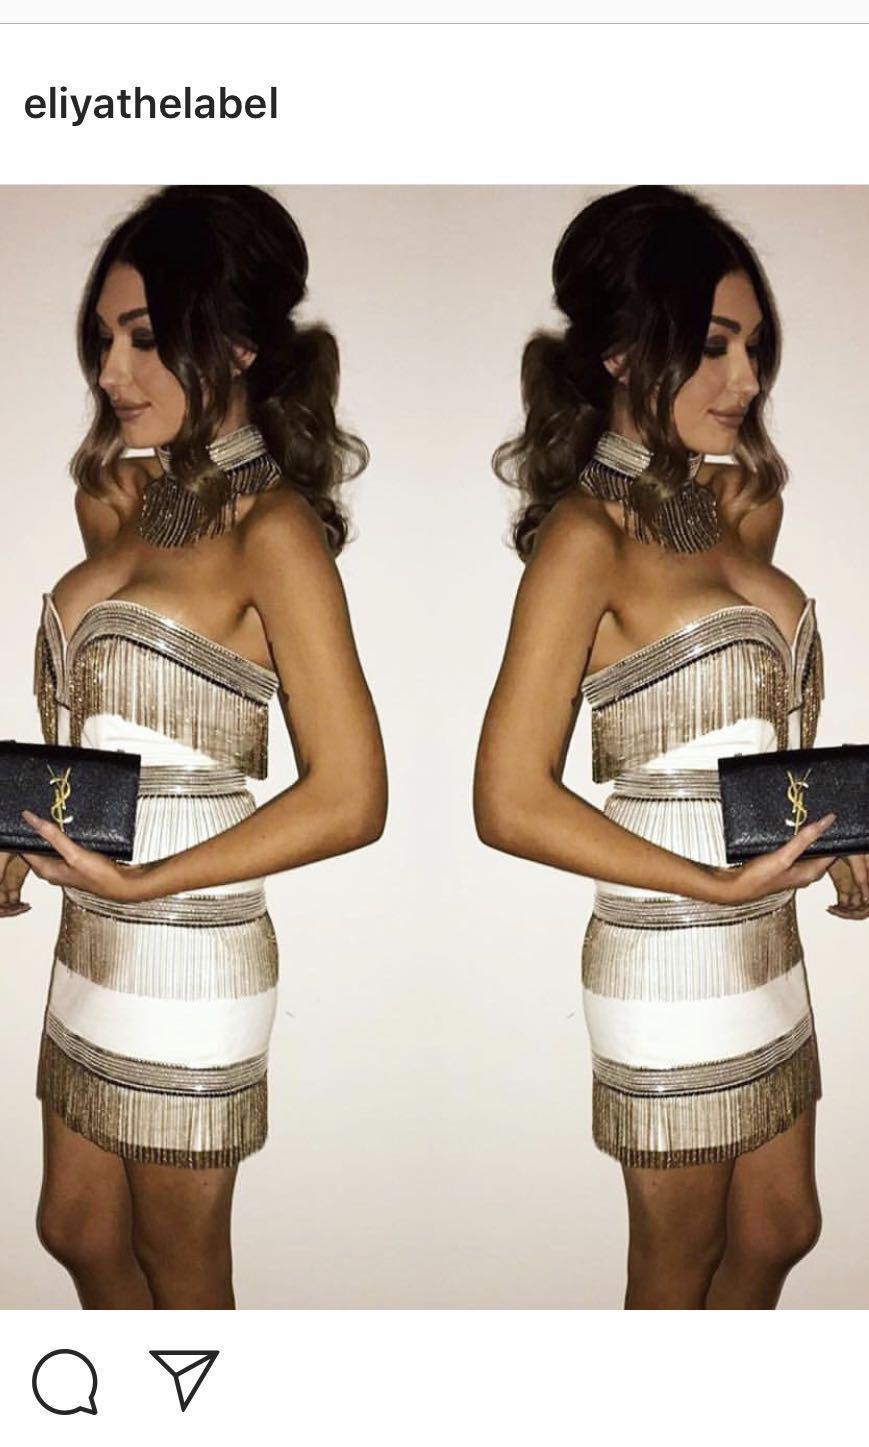 HIRING: Eliya the label Anarchy dress and choker